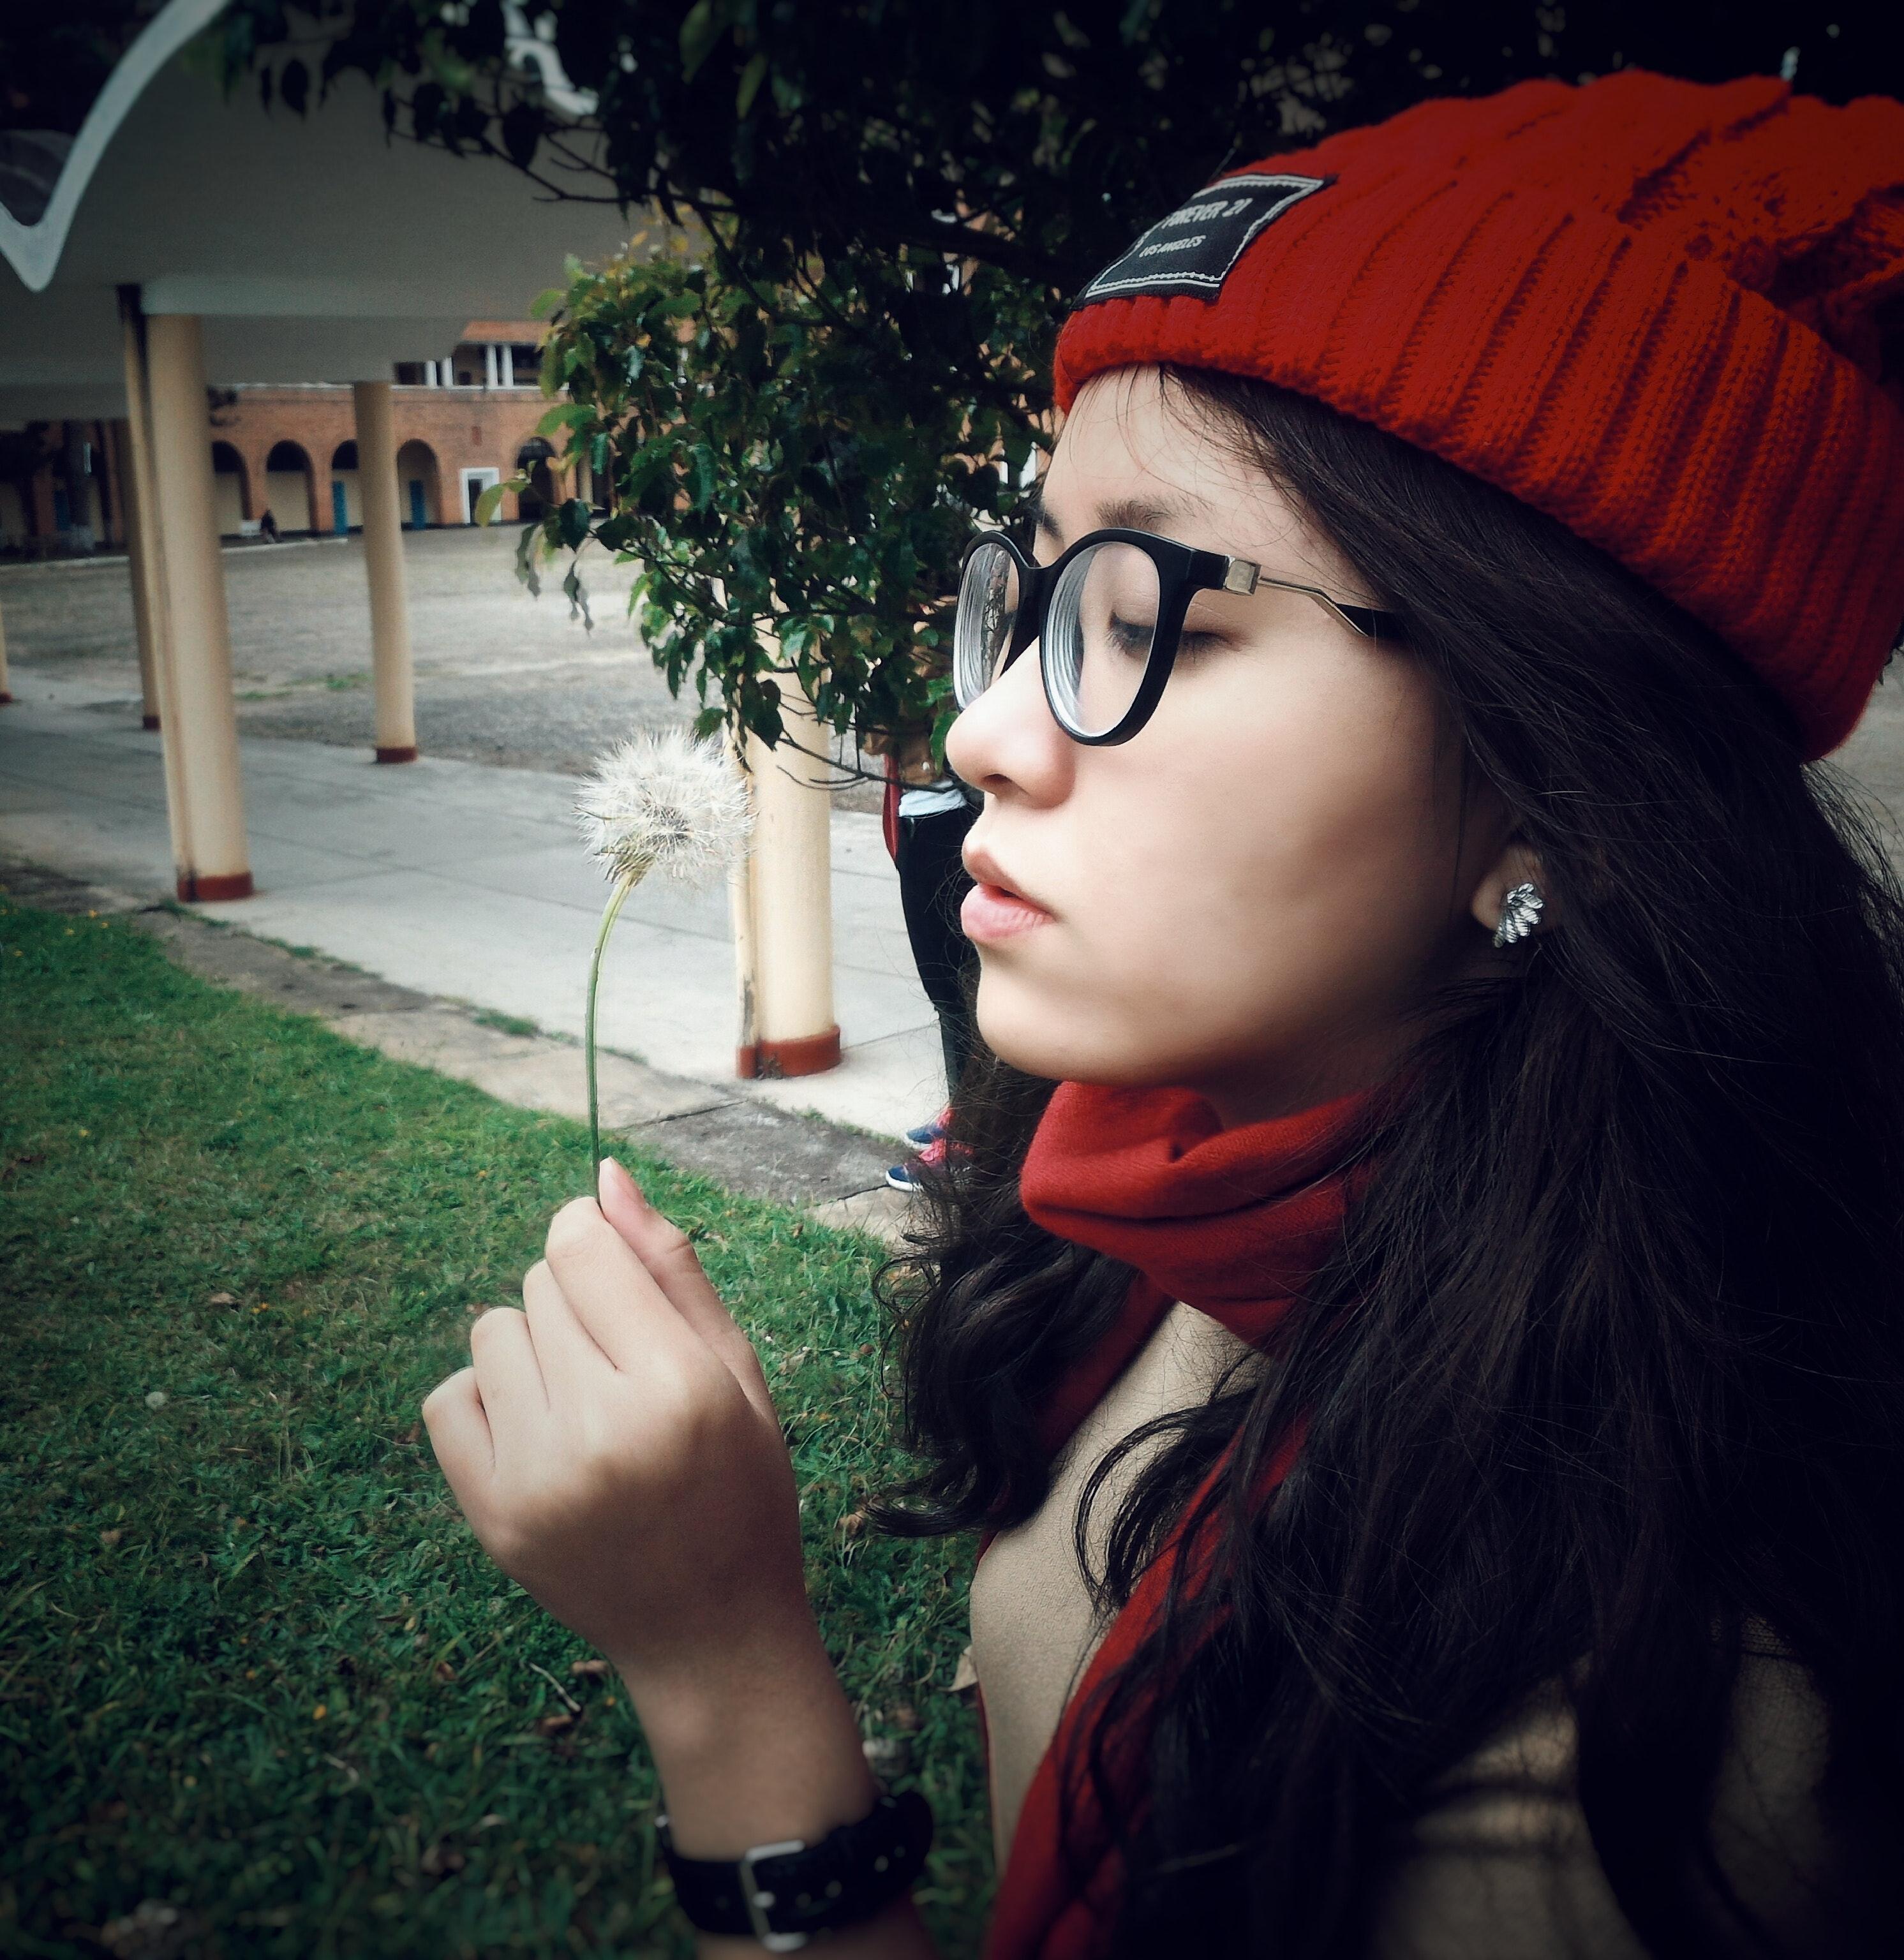 Woman wearing red beanie cap photo